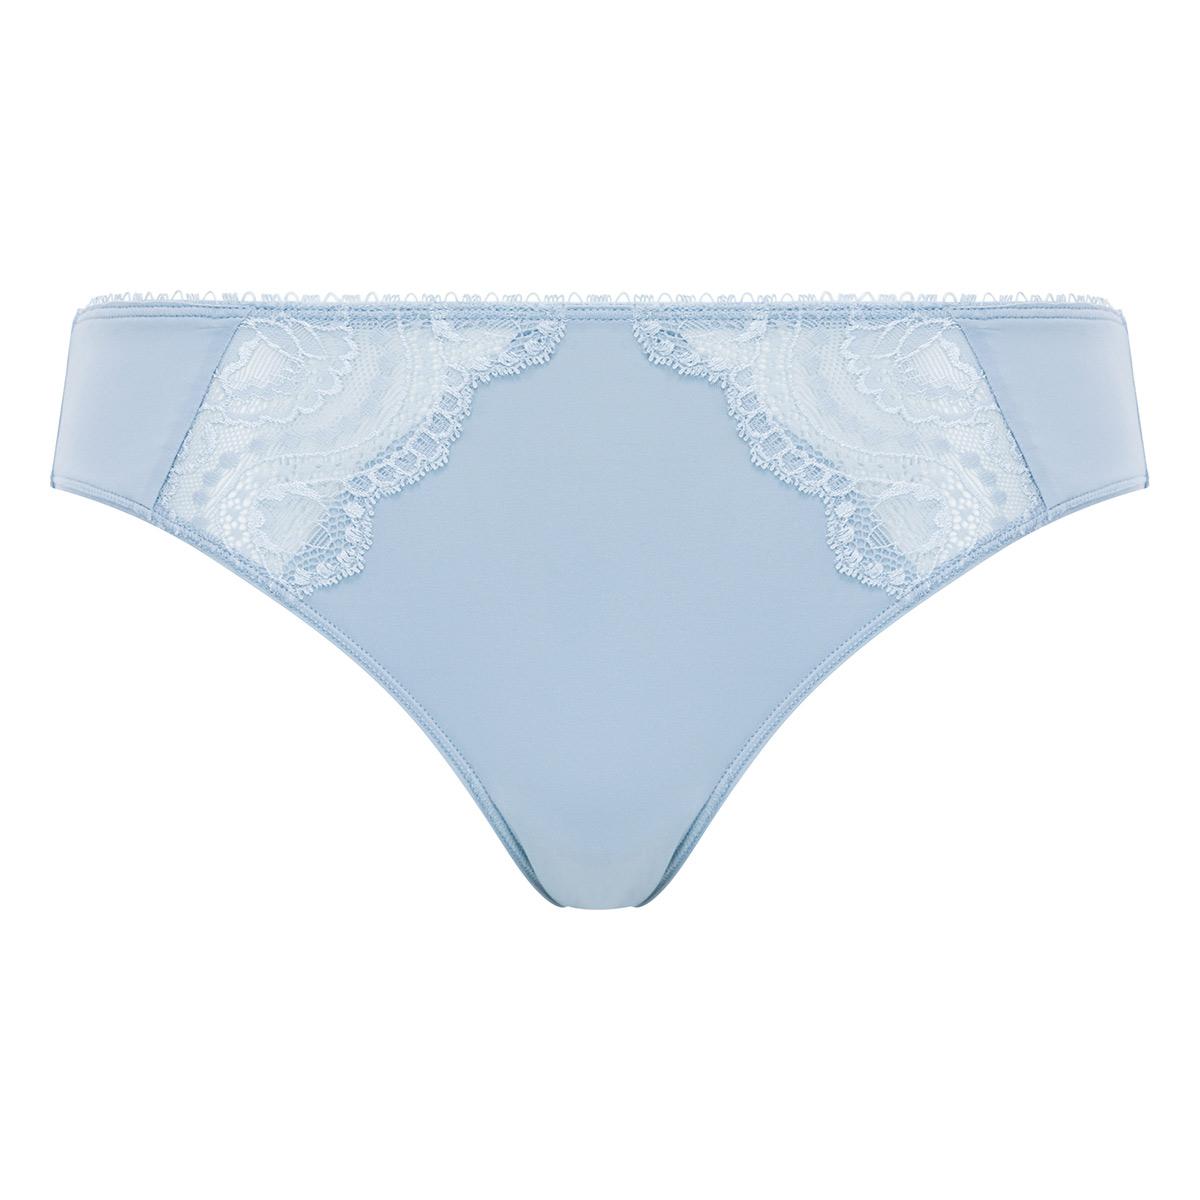 Culotte dentelle Mini gris bleuté - Flower Elegance, , PLAYTEX